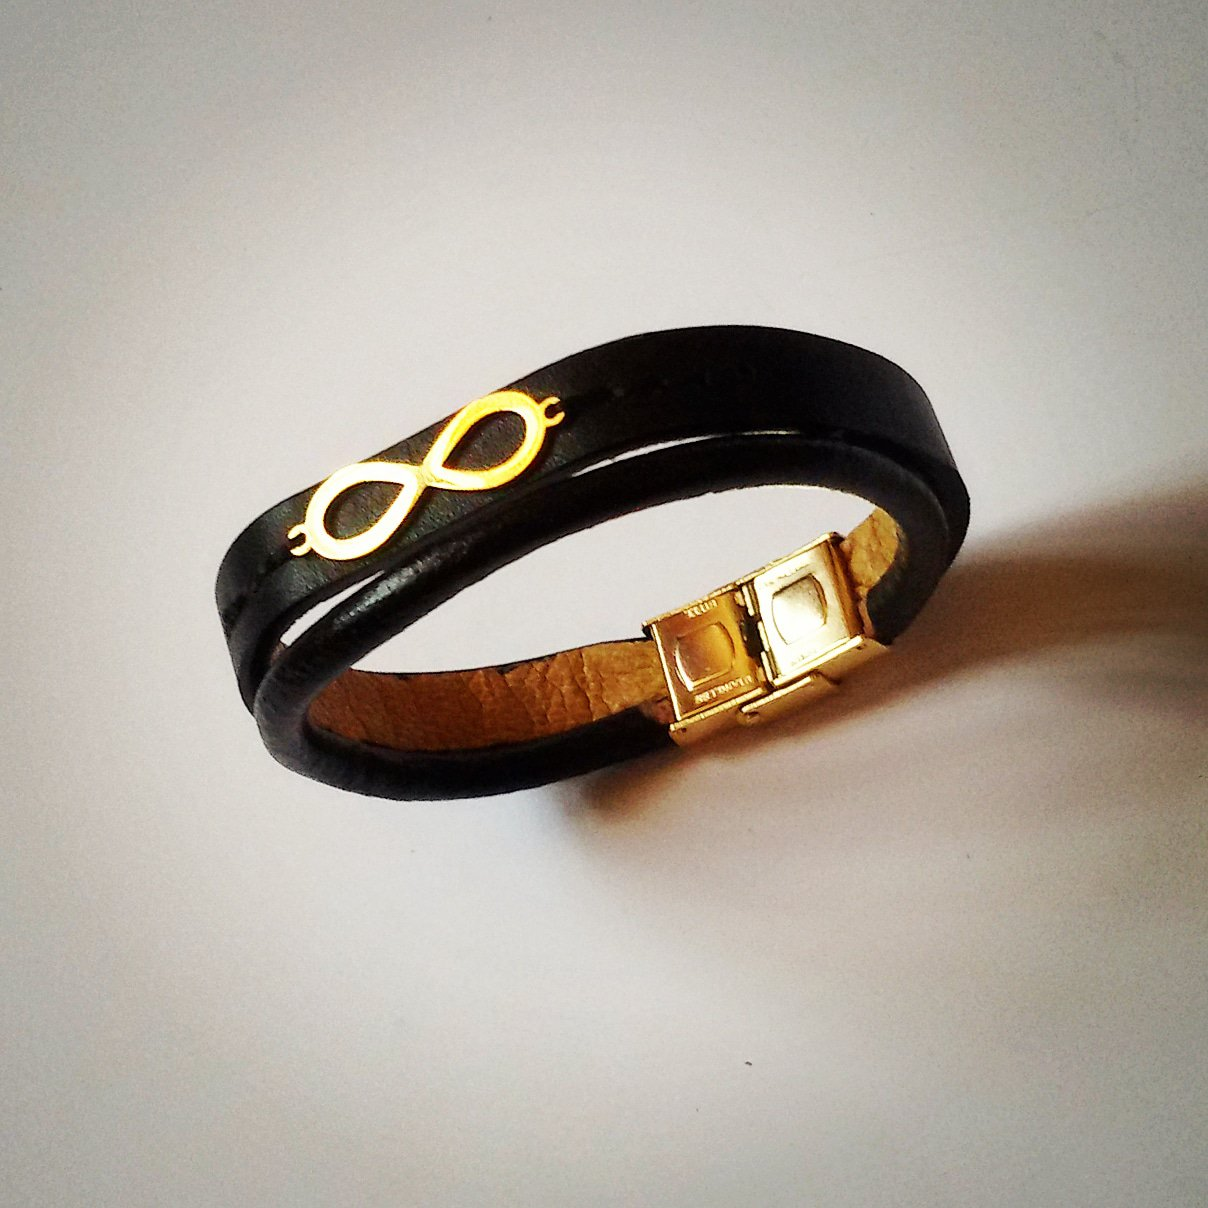 دستبند چرم طرح بینهایت